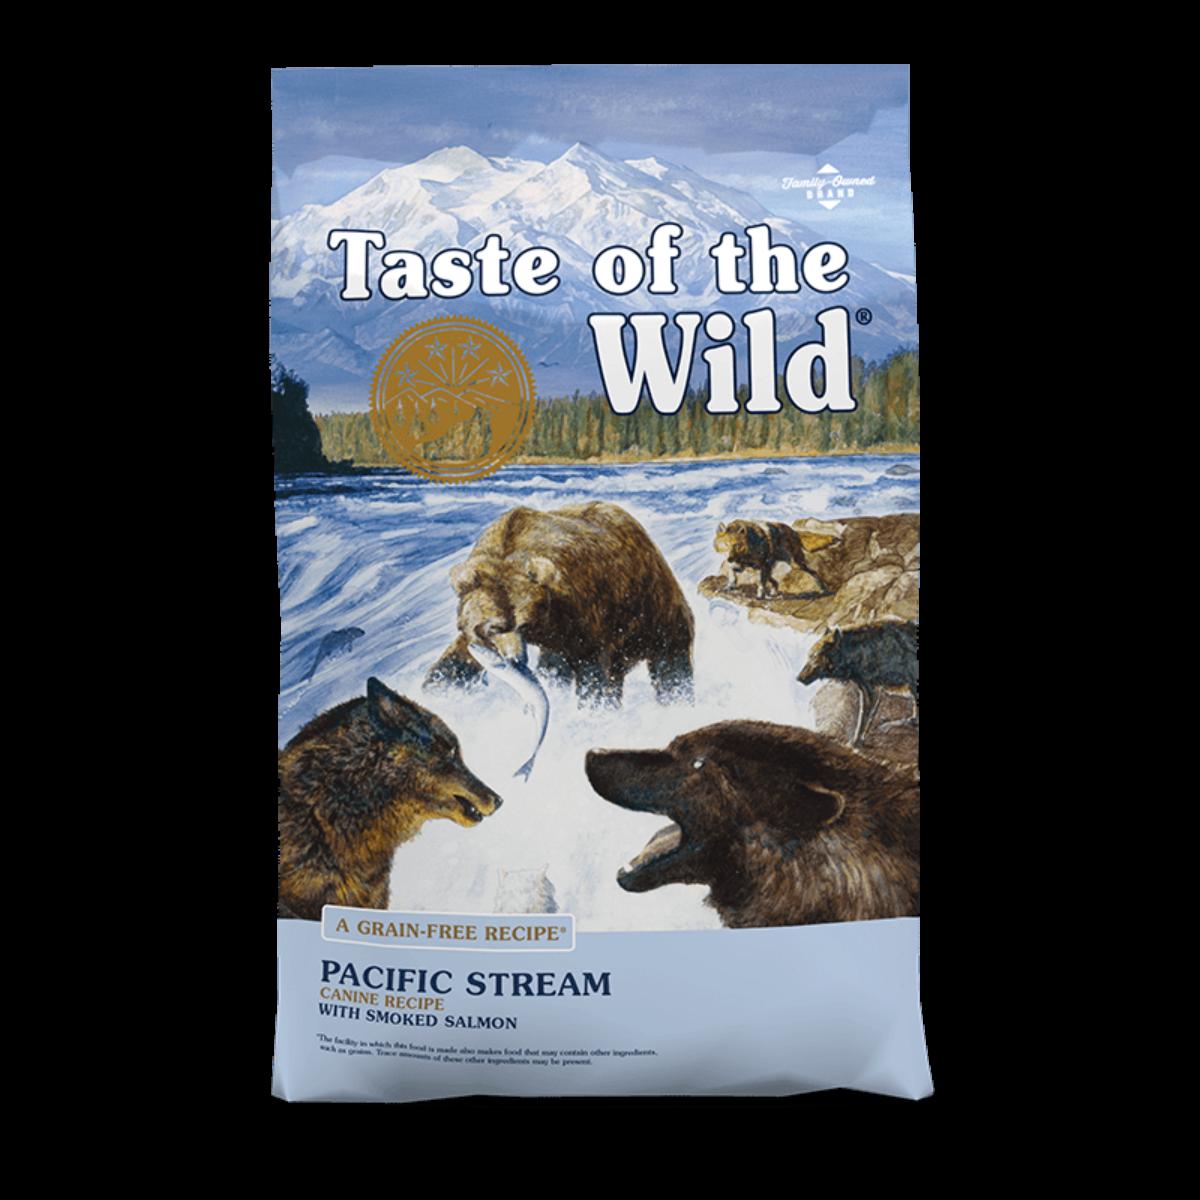 Taste of the Wild Pacific Stream Dog Food - Smoked Salmon